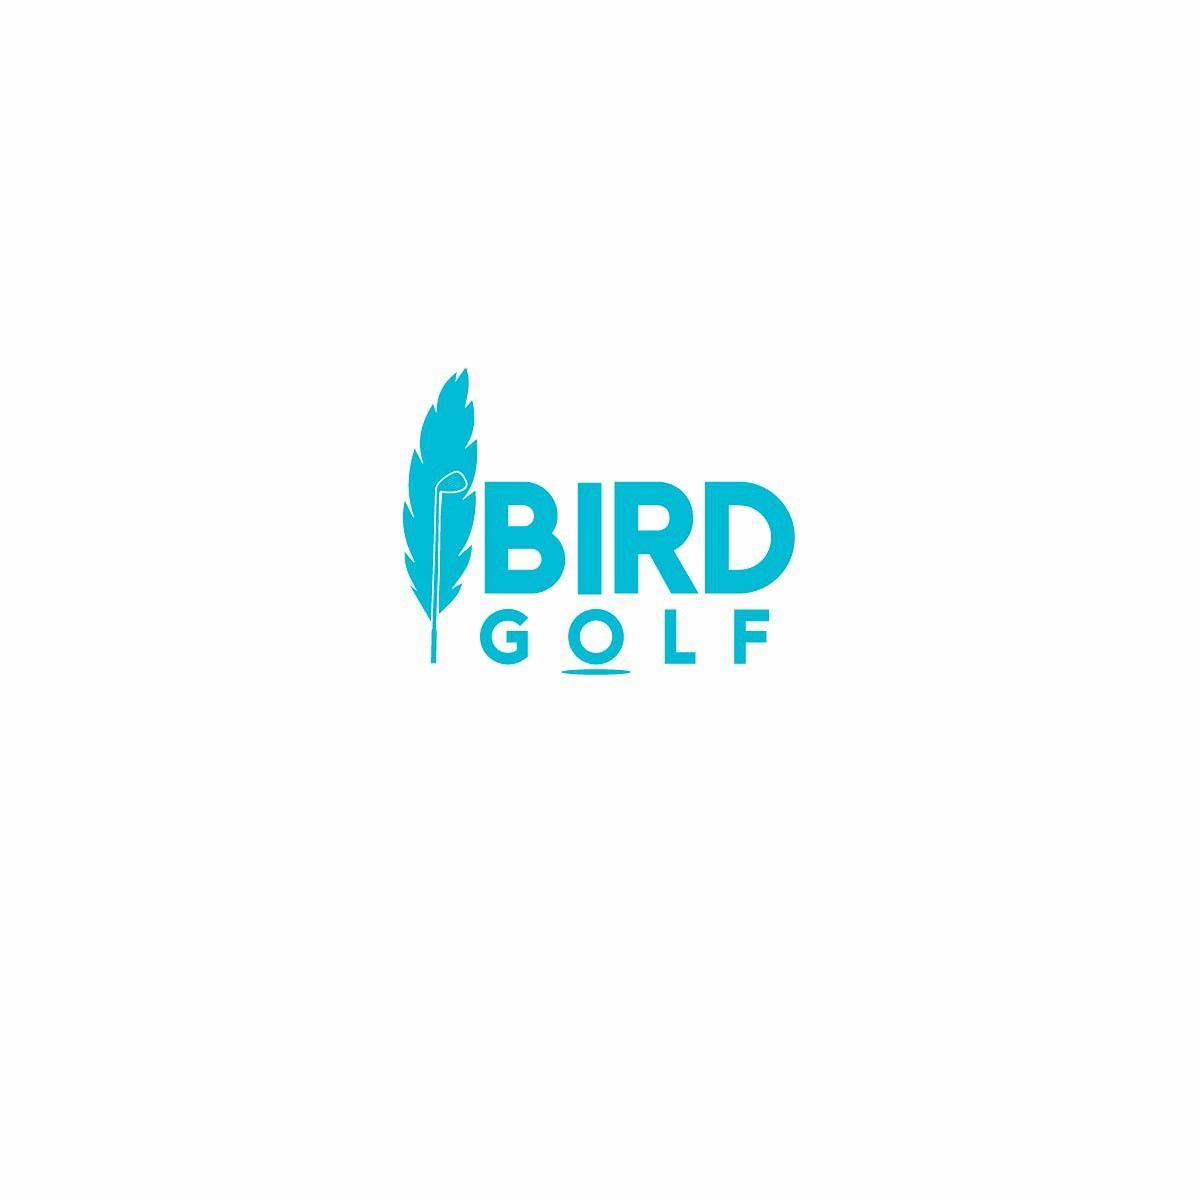 21+ Bird golf logo ideas